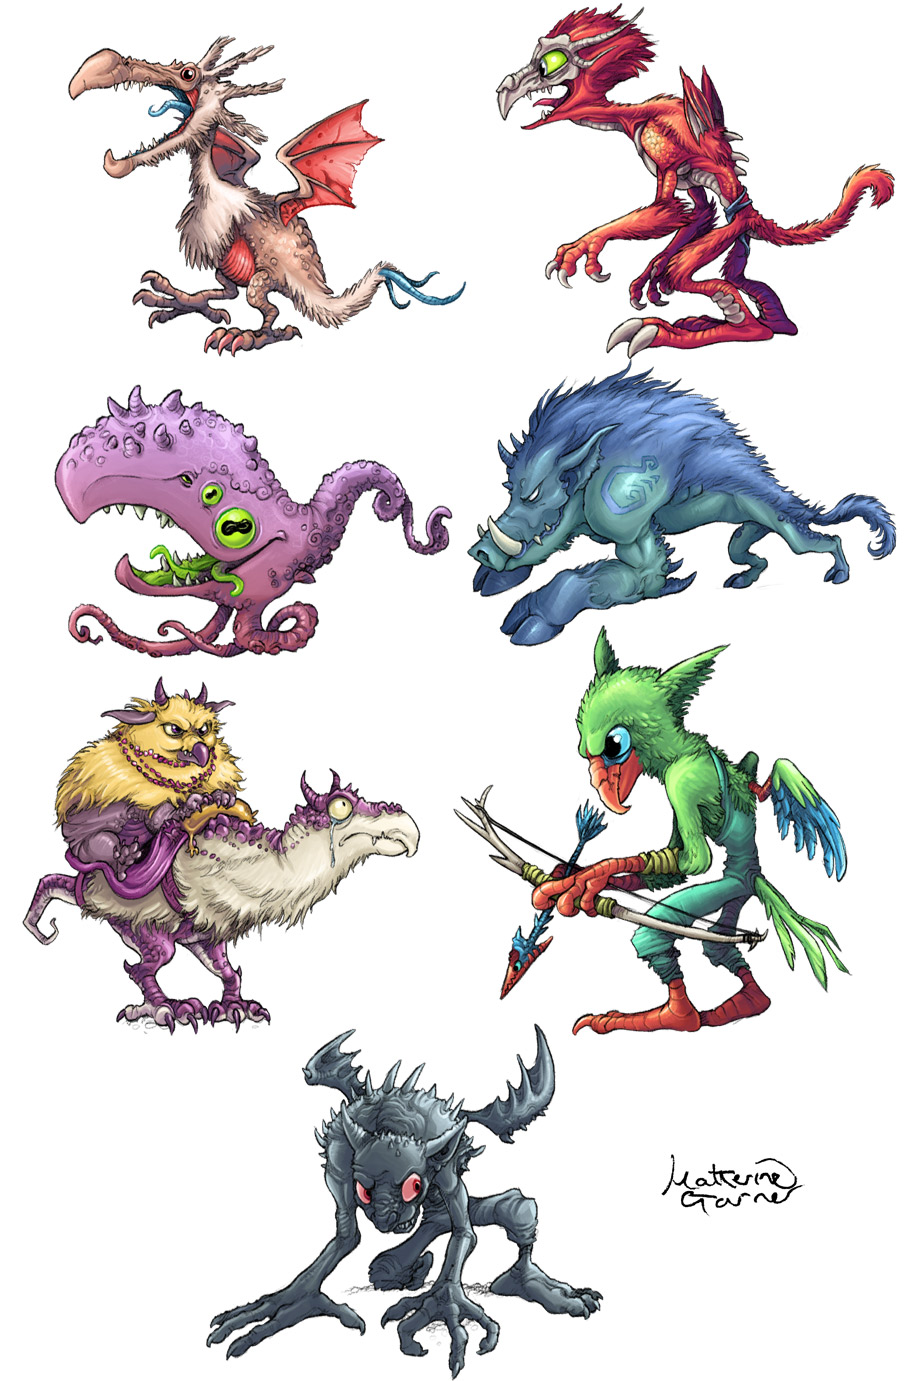 Monster designs by Katherine Garner